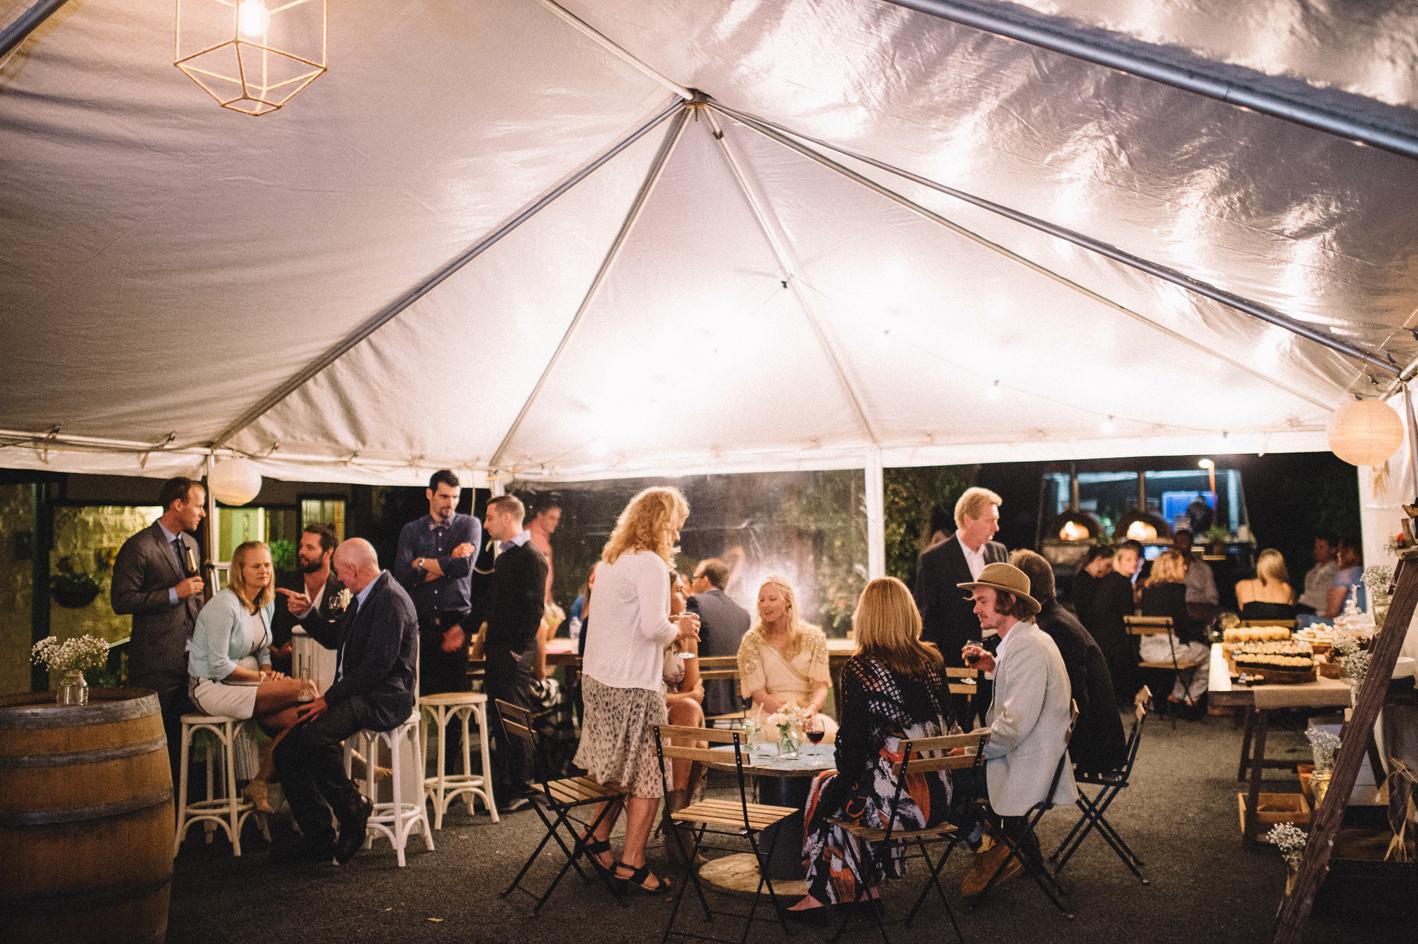 081-michelle-reagan-mount-tamborine-wedding-sophie-baker-photography